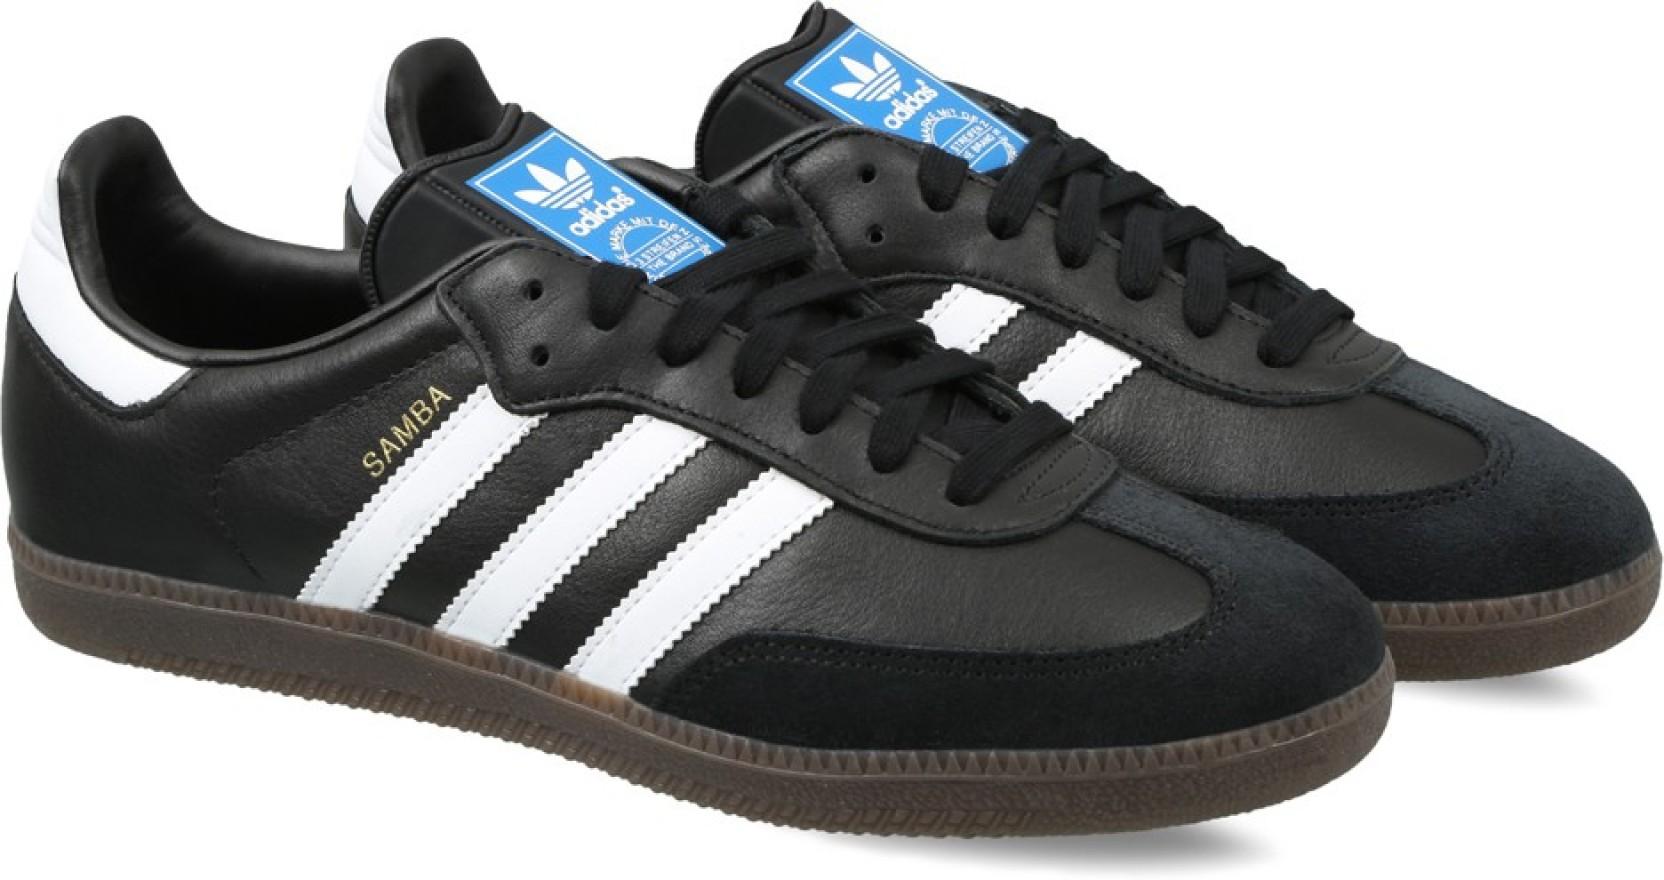 a675a052acc9d8 ADIDAS ORIGINALS SAMBA OG Sneakers For Men - Buy CBLACK FTWWHT GUM5 ...